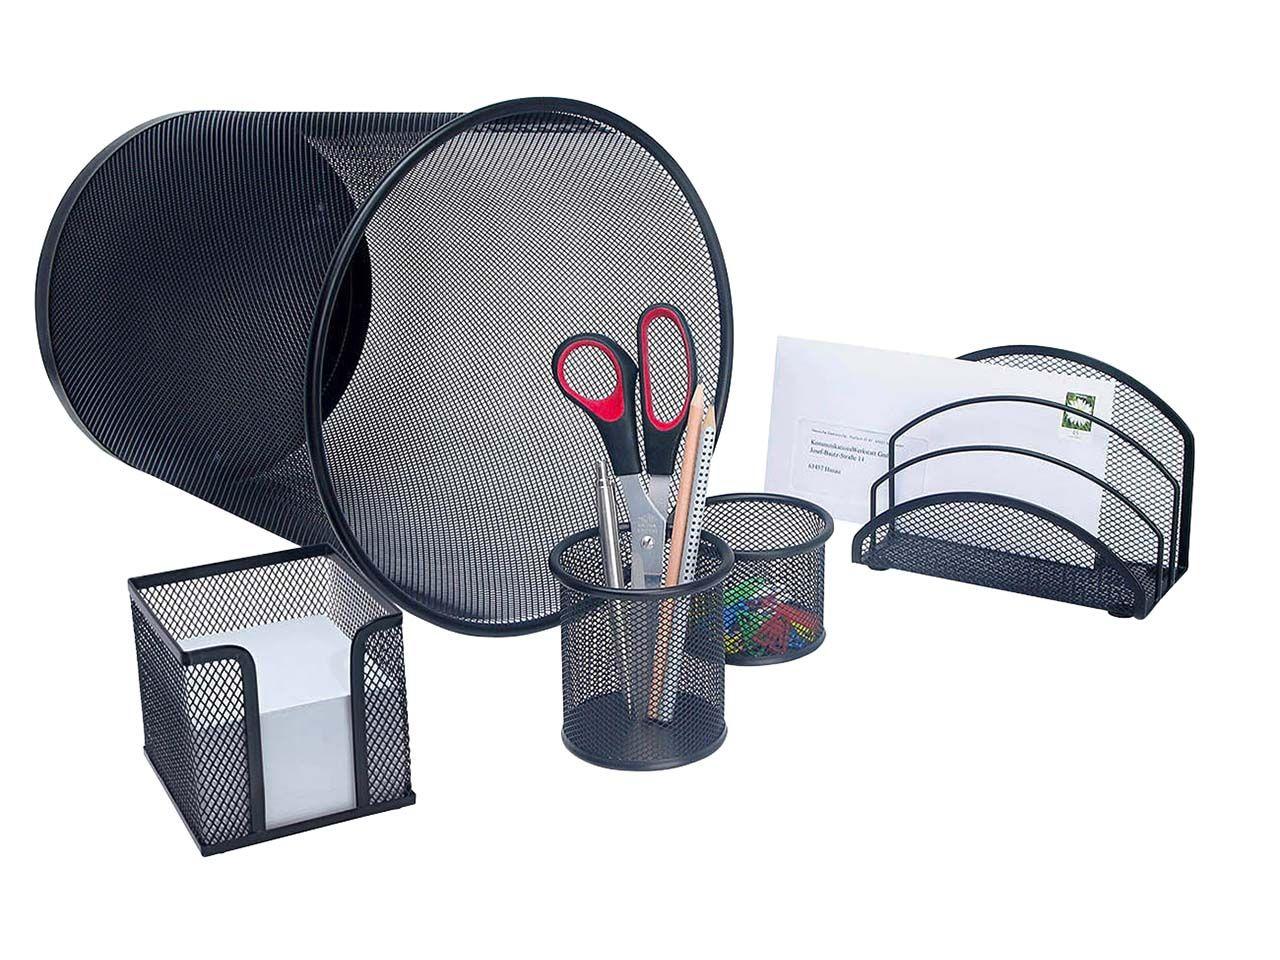 Wedo Office-Set m. Papierkorb Metall schwarz 5-teilig 065101